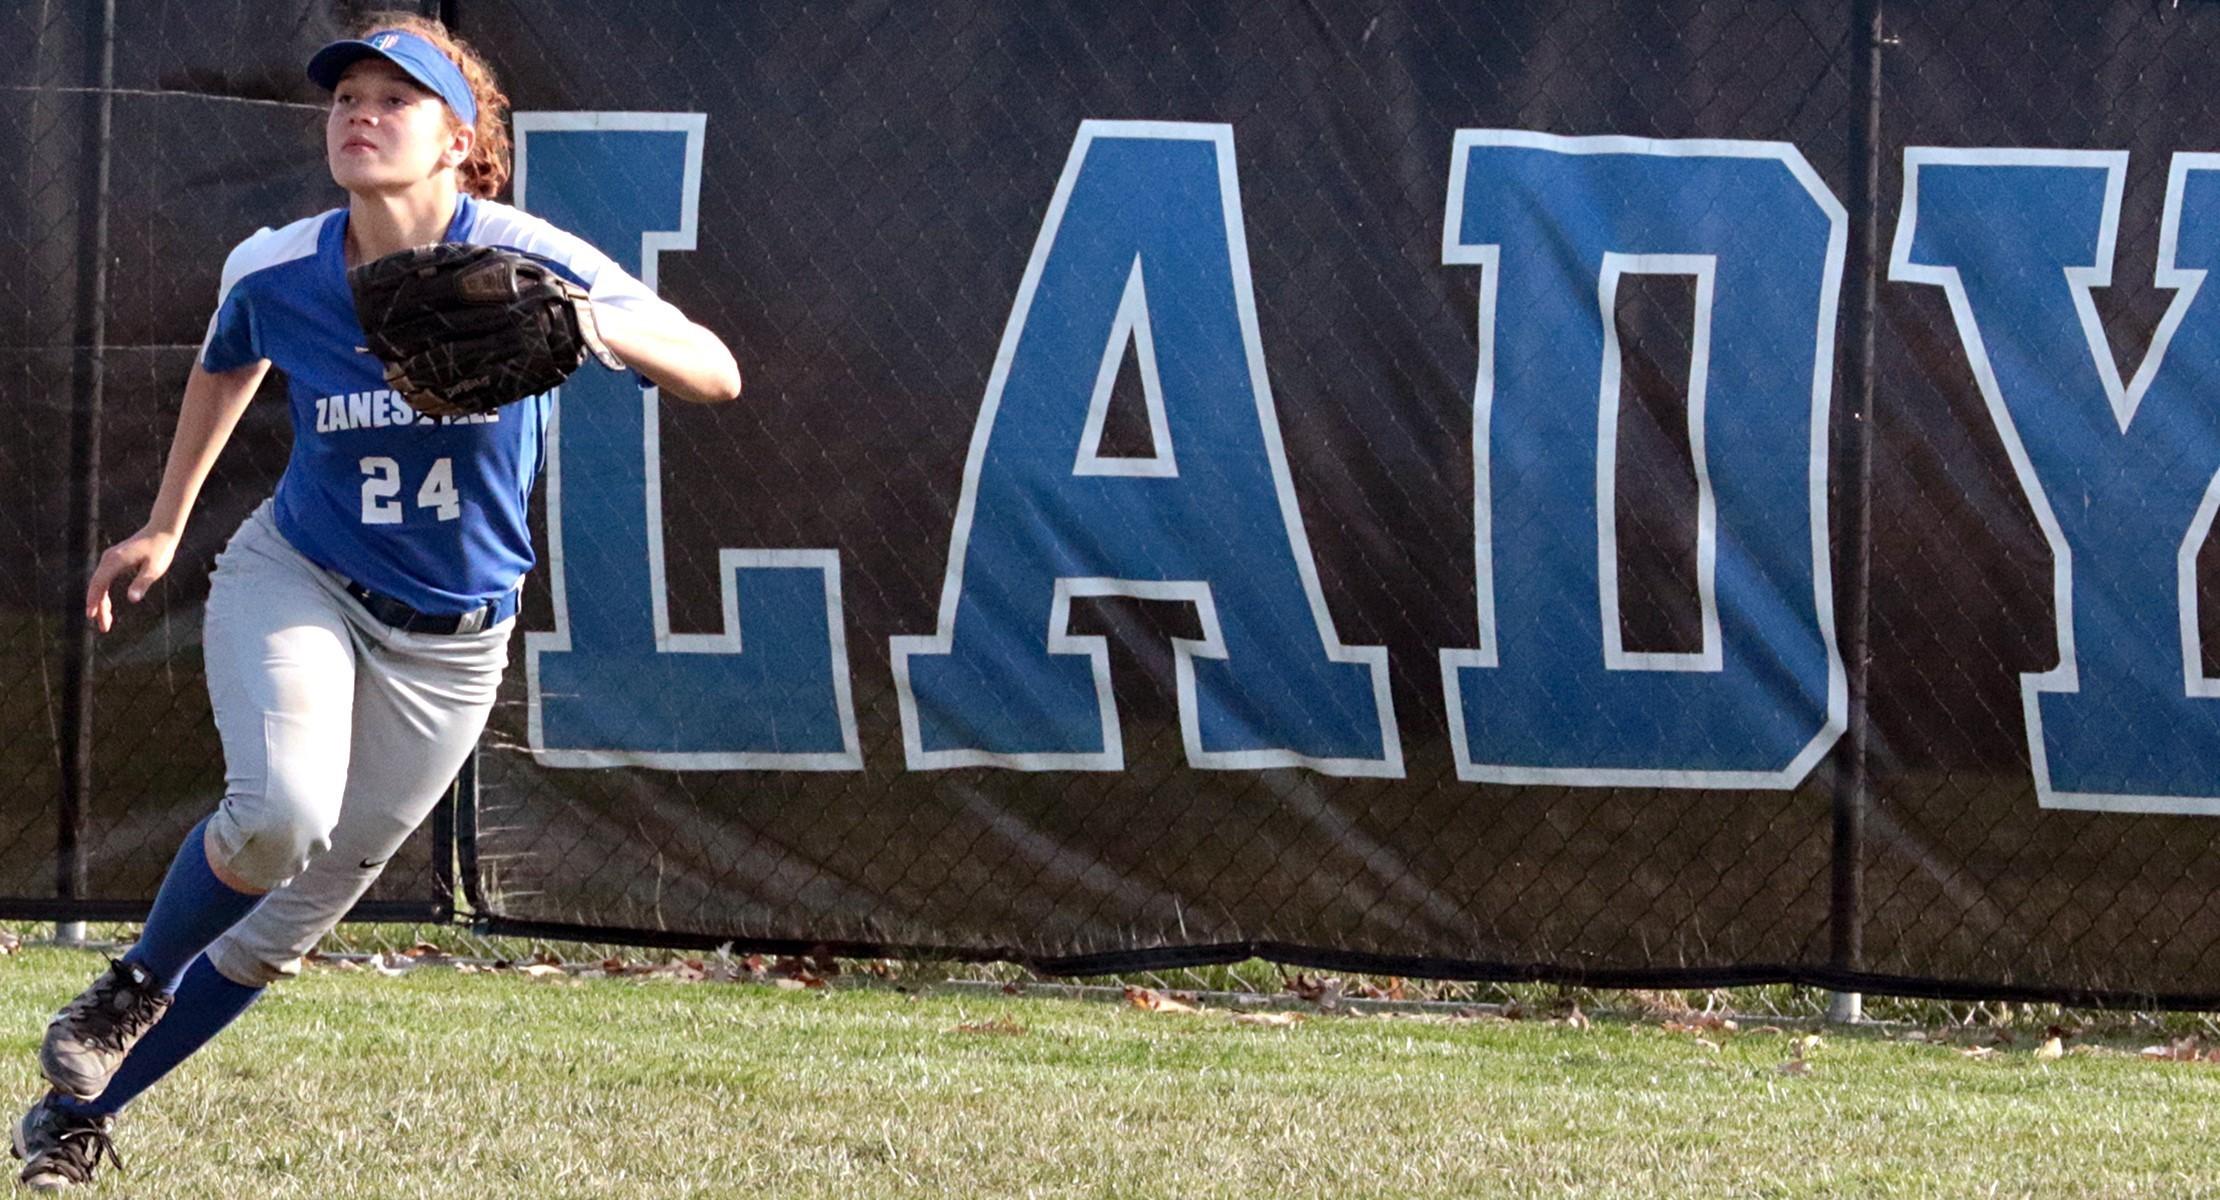 Softball outfielder running to catch the ball